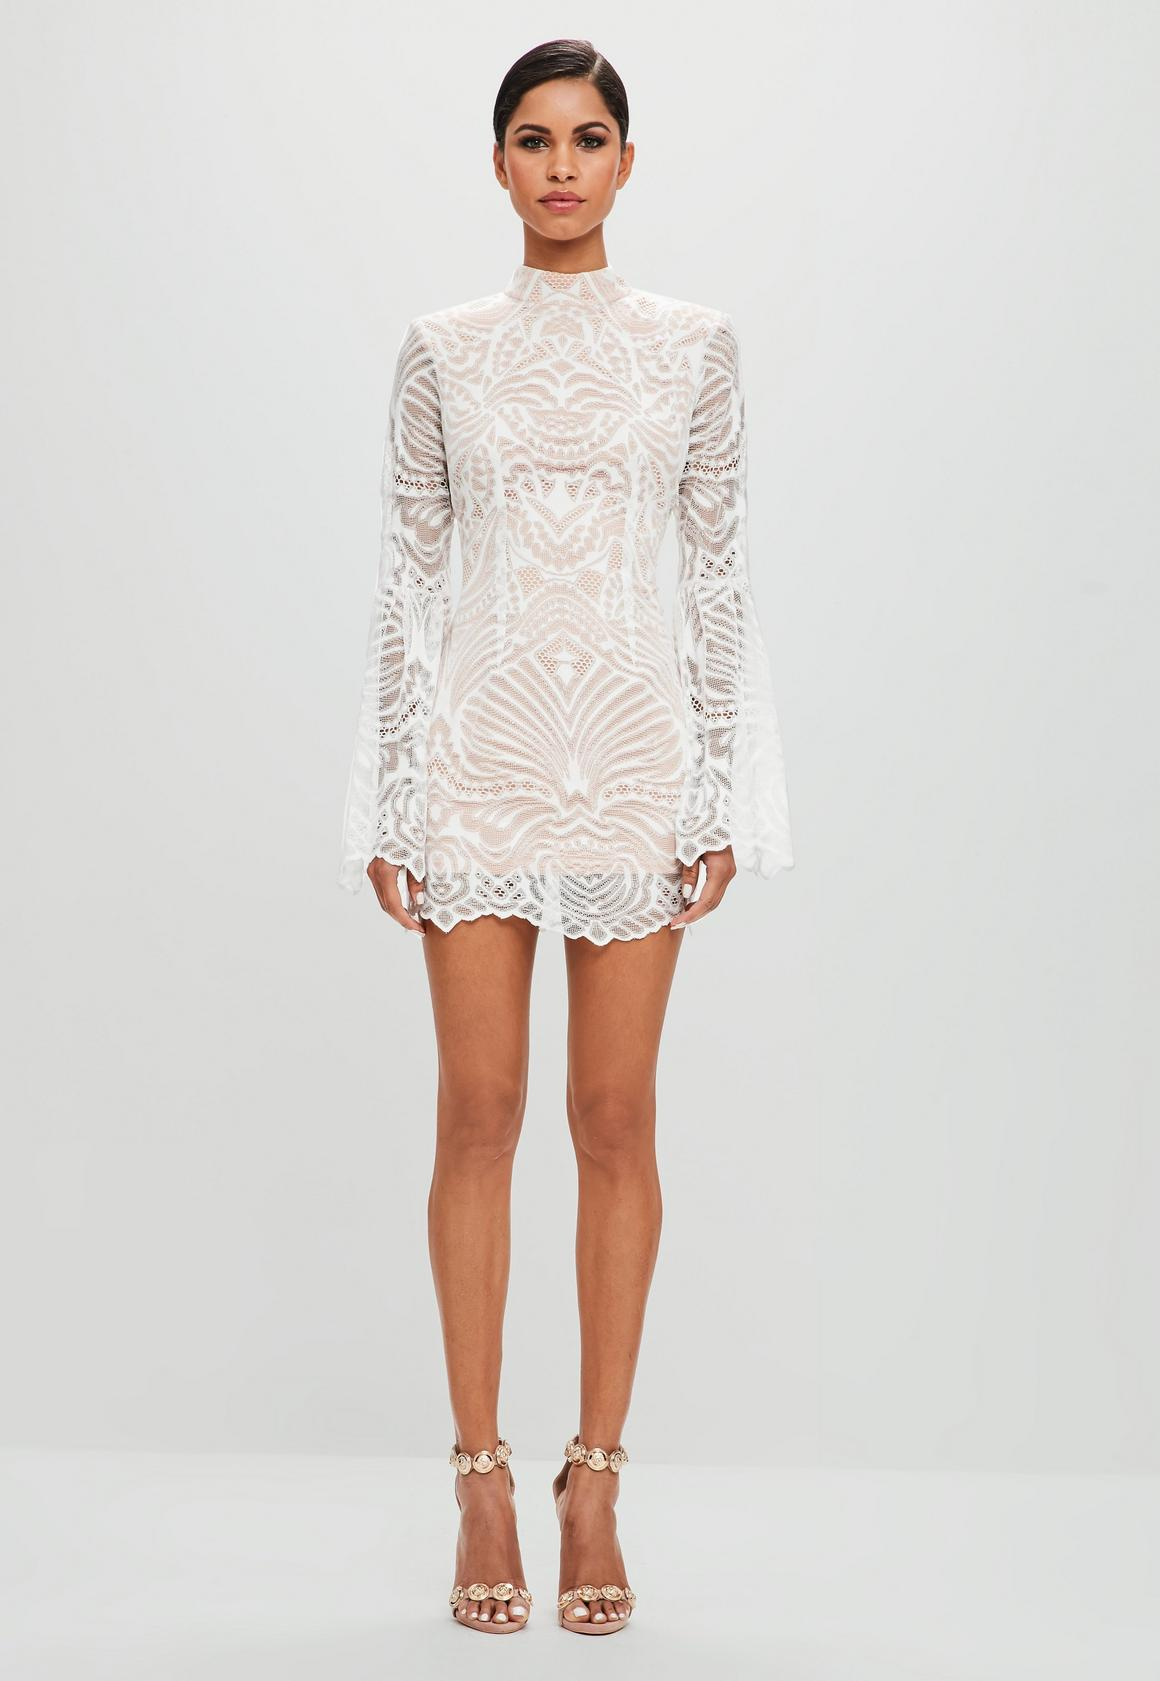 Image of lace dress